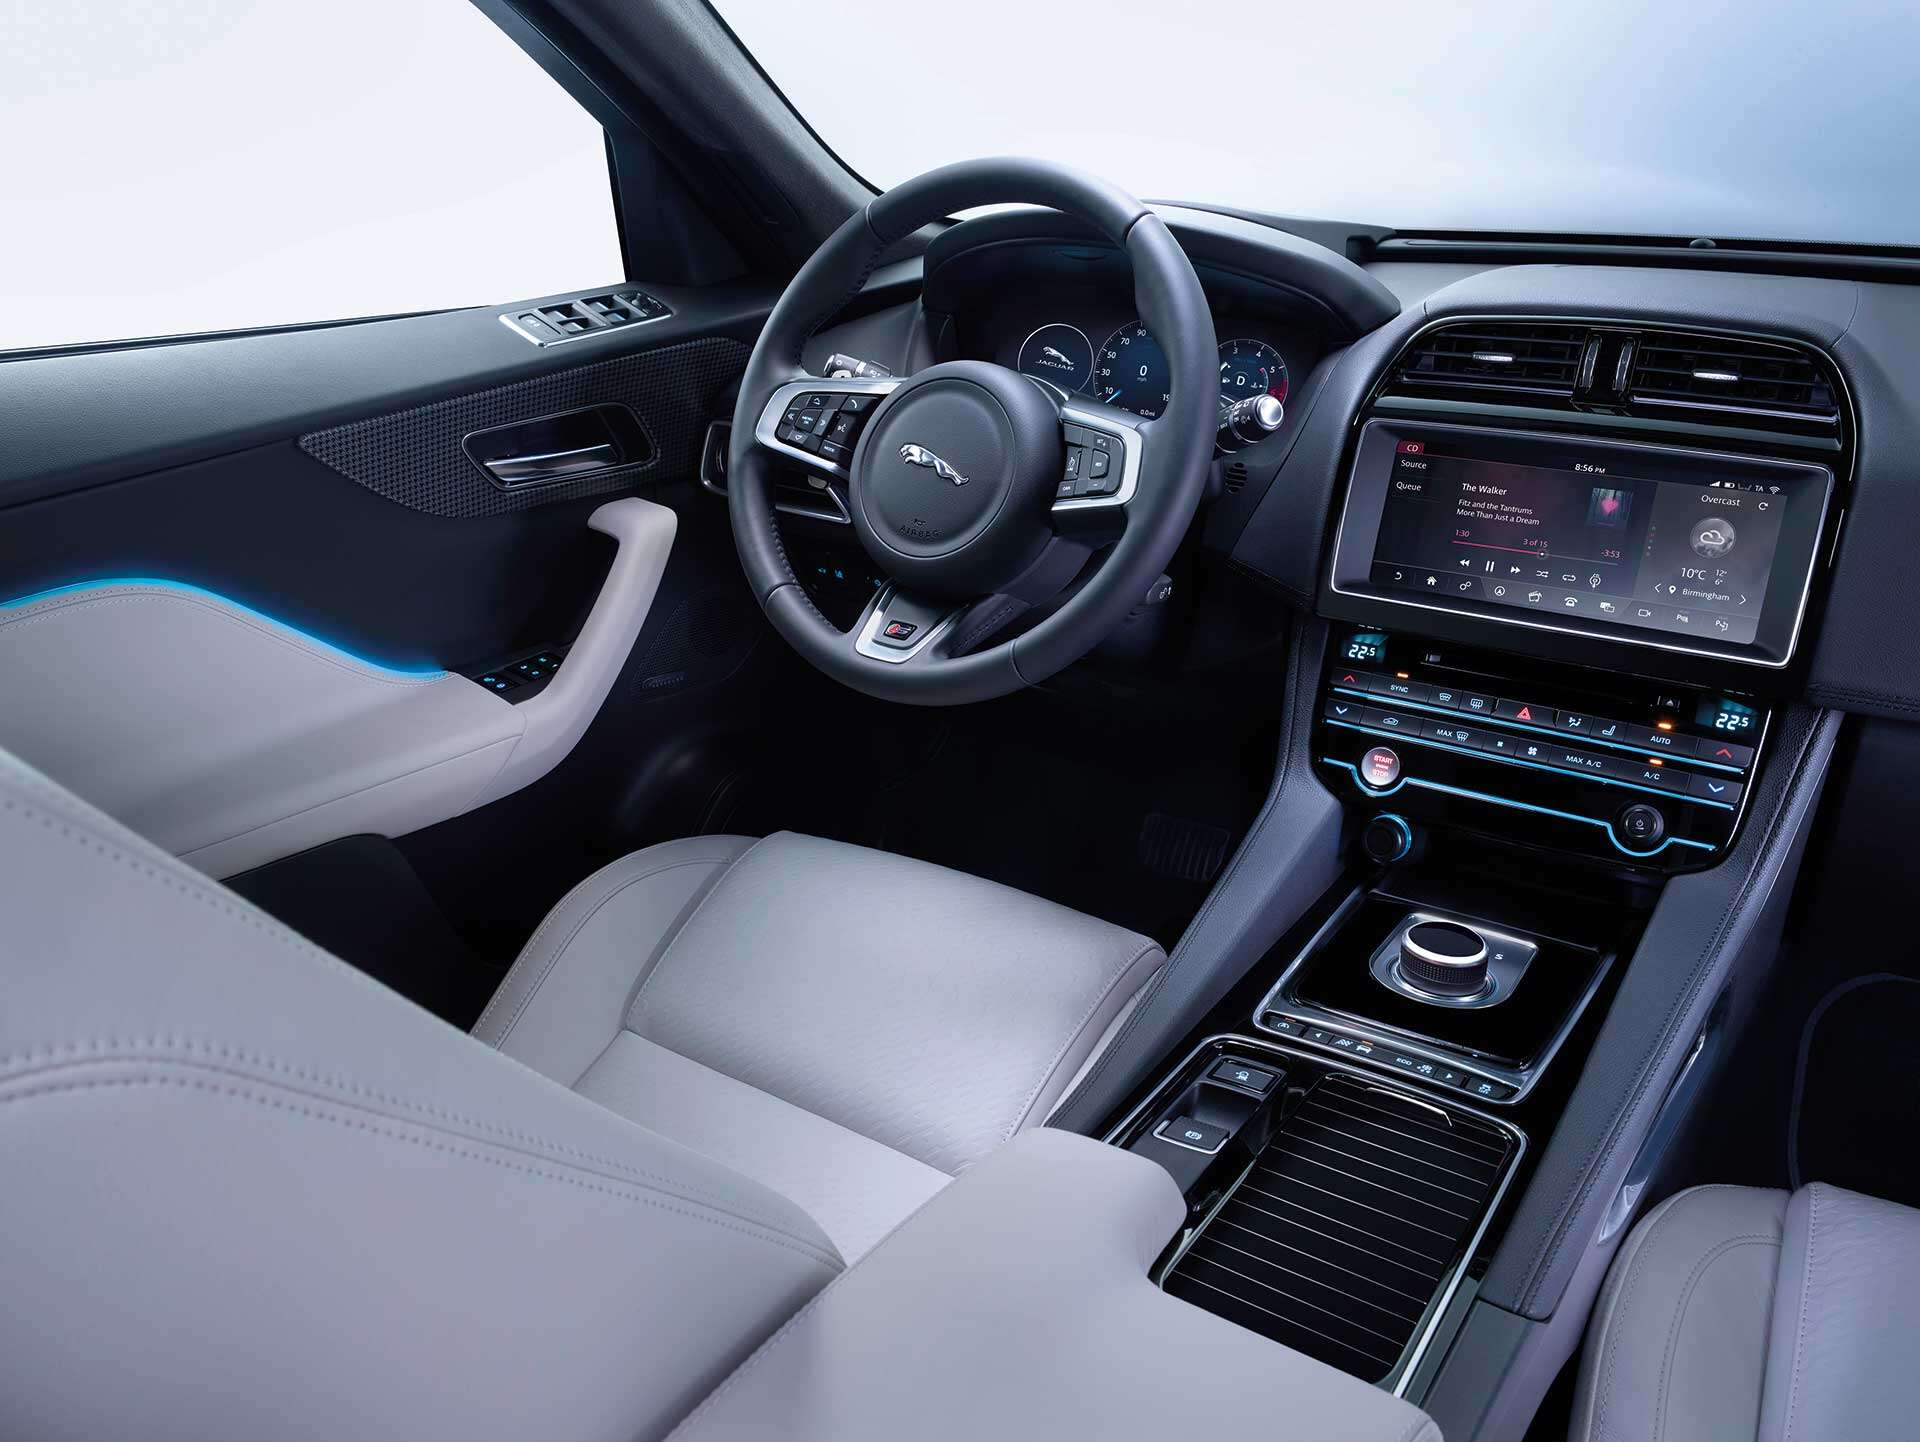 2018 jaguar f-pace s test drive review: the surprisingly fun-to